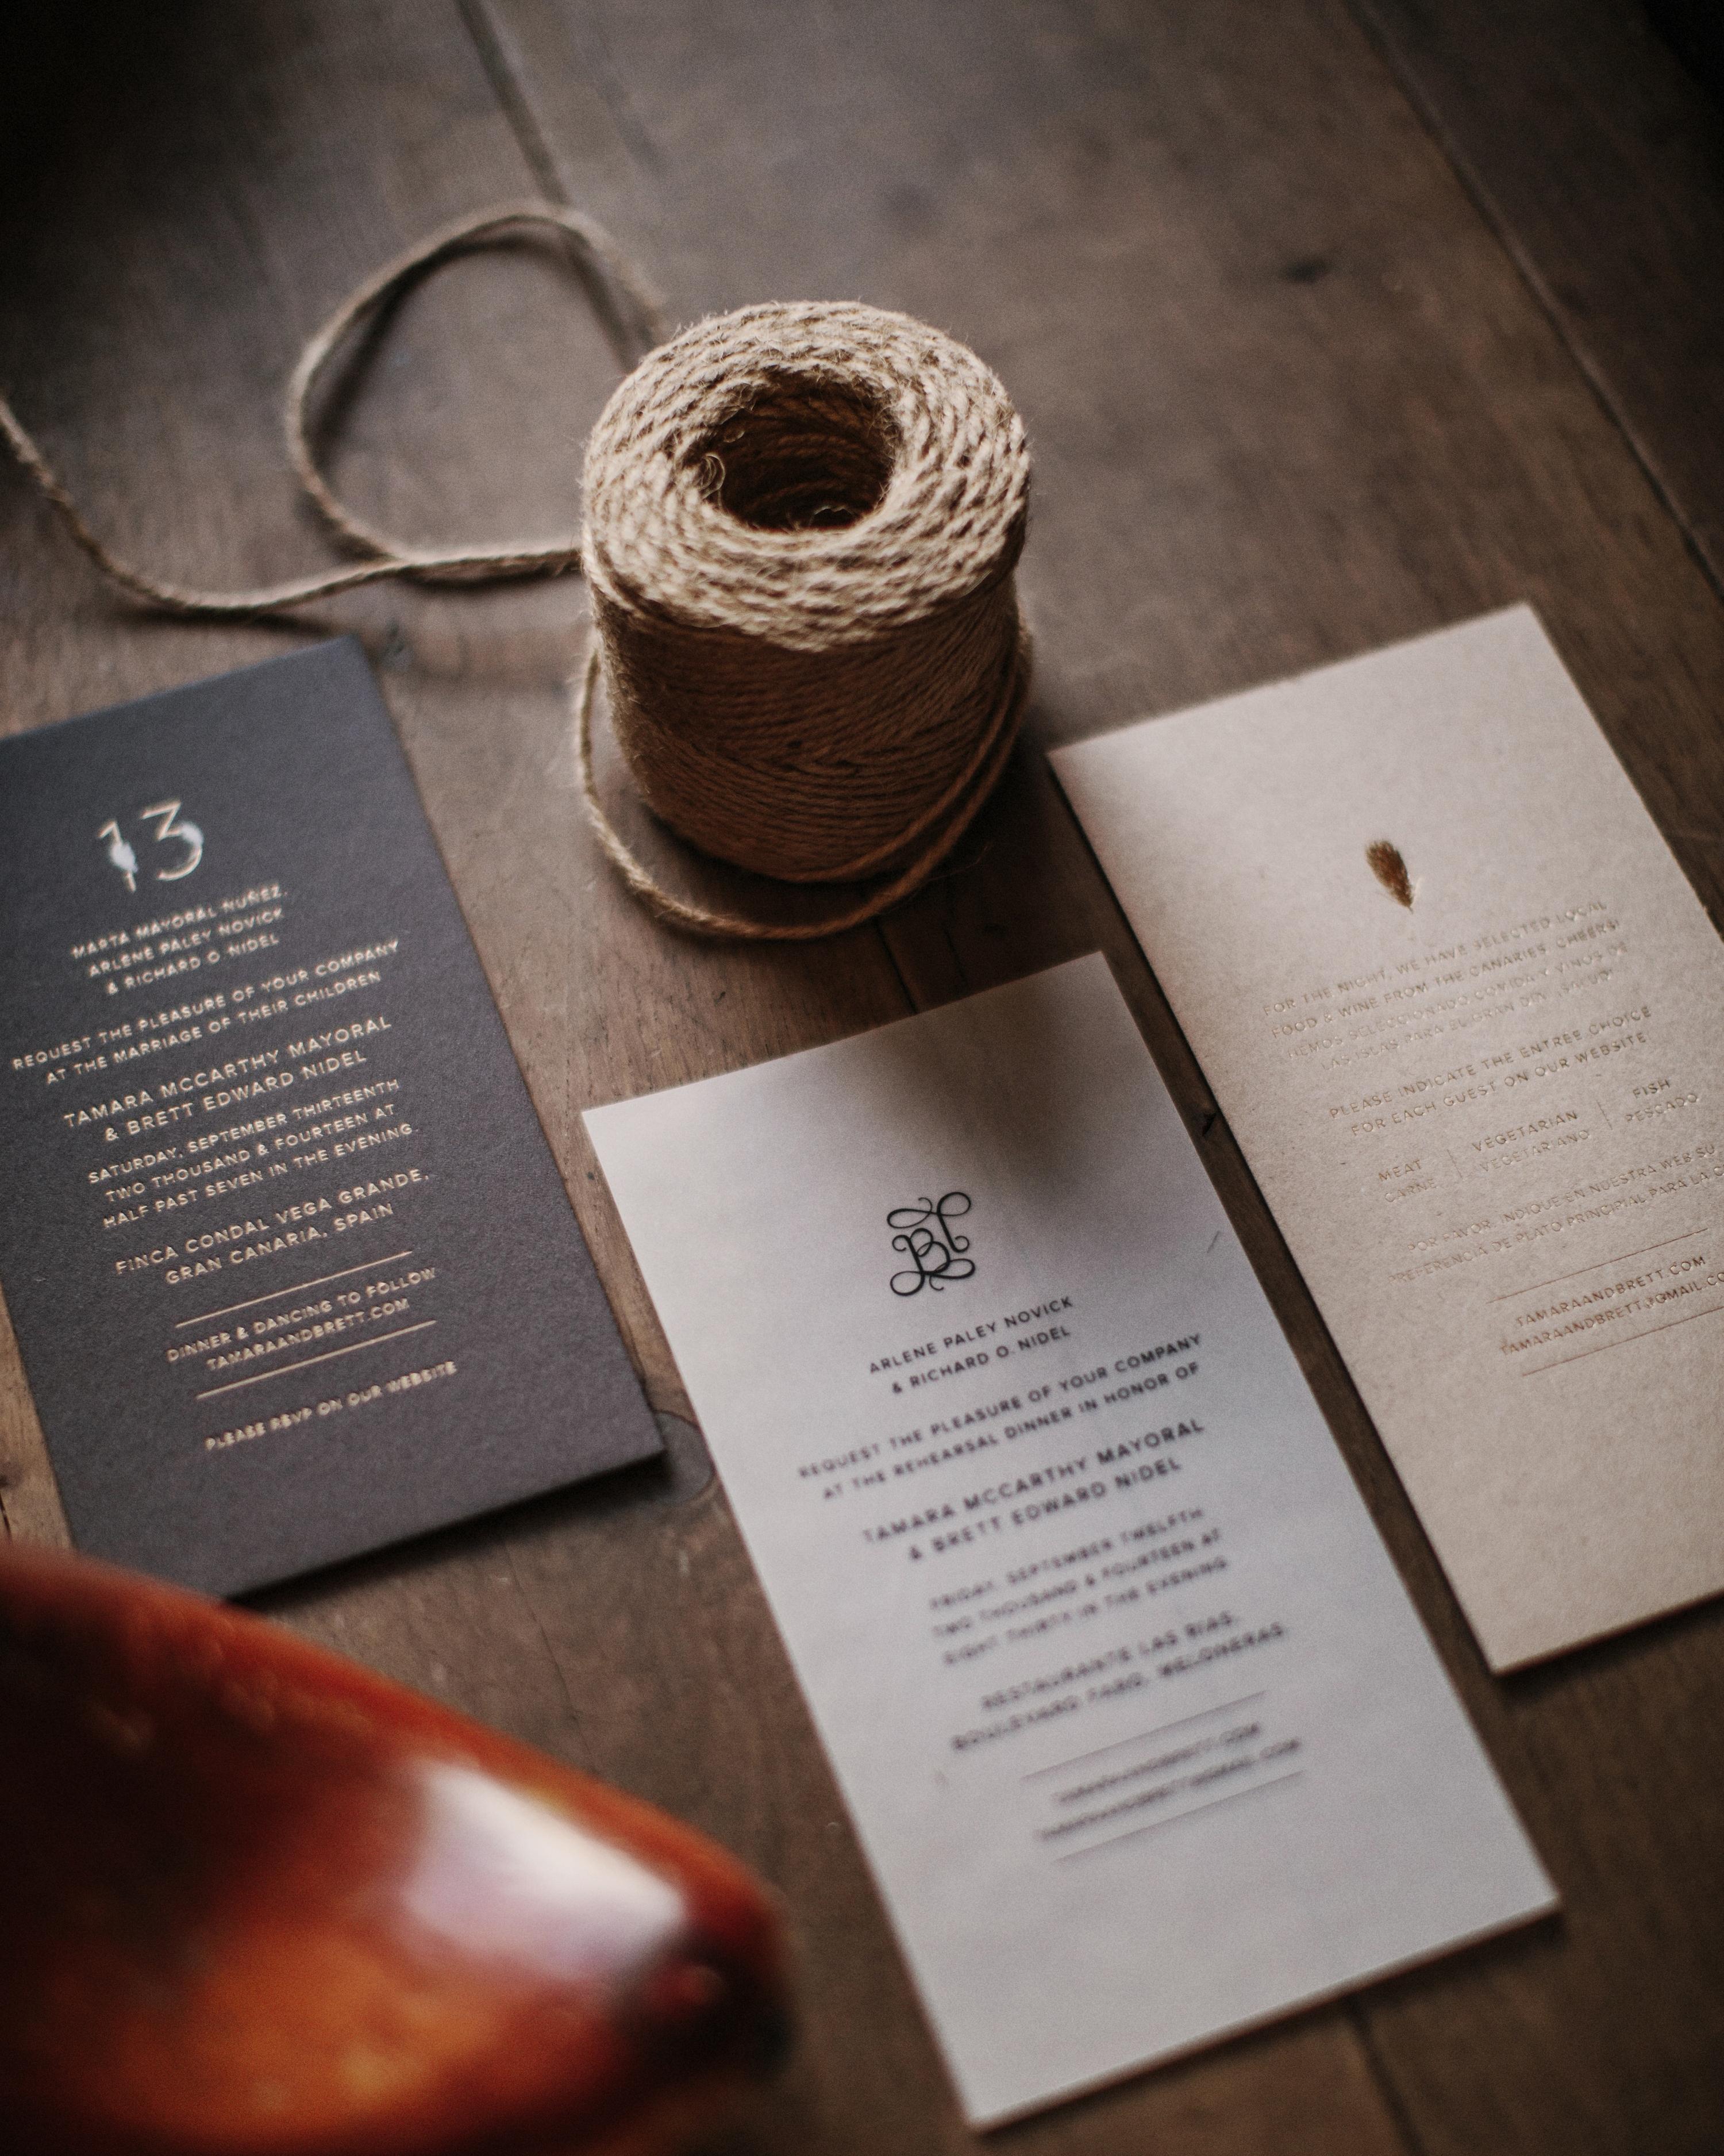 tamara-brett-wedding-stationery-6916-s112120-0915.jpg